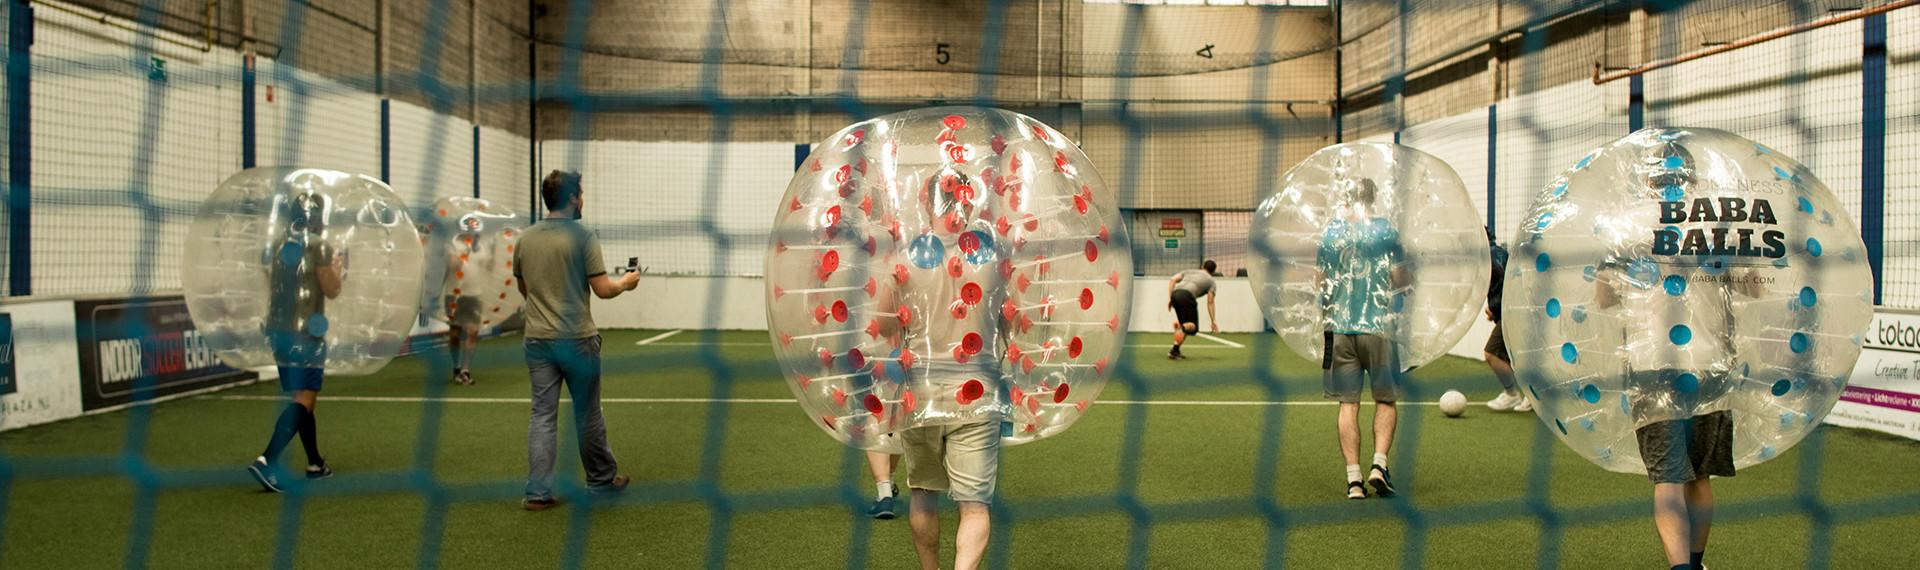 Bubble Football Tallinn